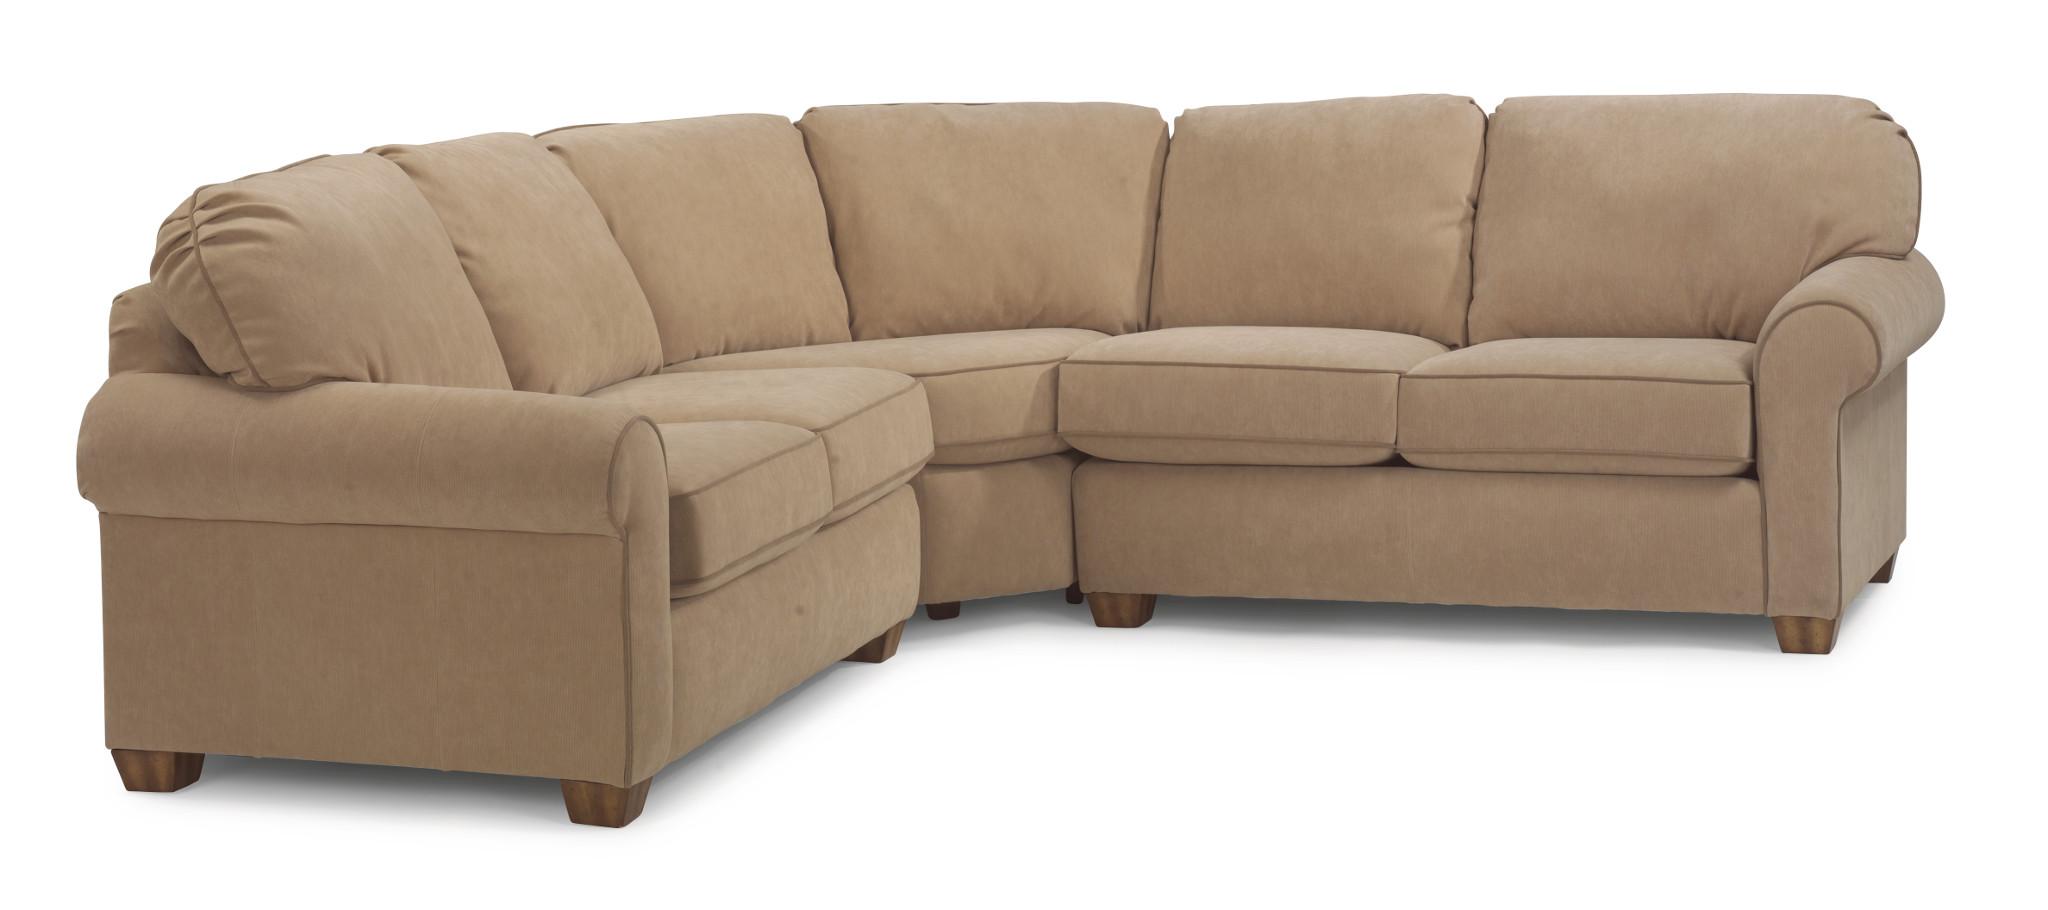 Sensational Flexsteel Thornton Leather Sectional 3535 Sect Appliance Ibusinesslaw Wood Chair Design Ideas Ibusinesslaworg